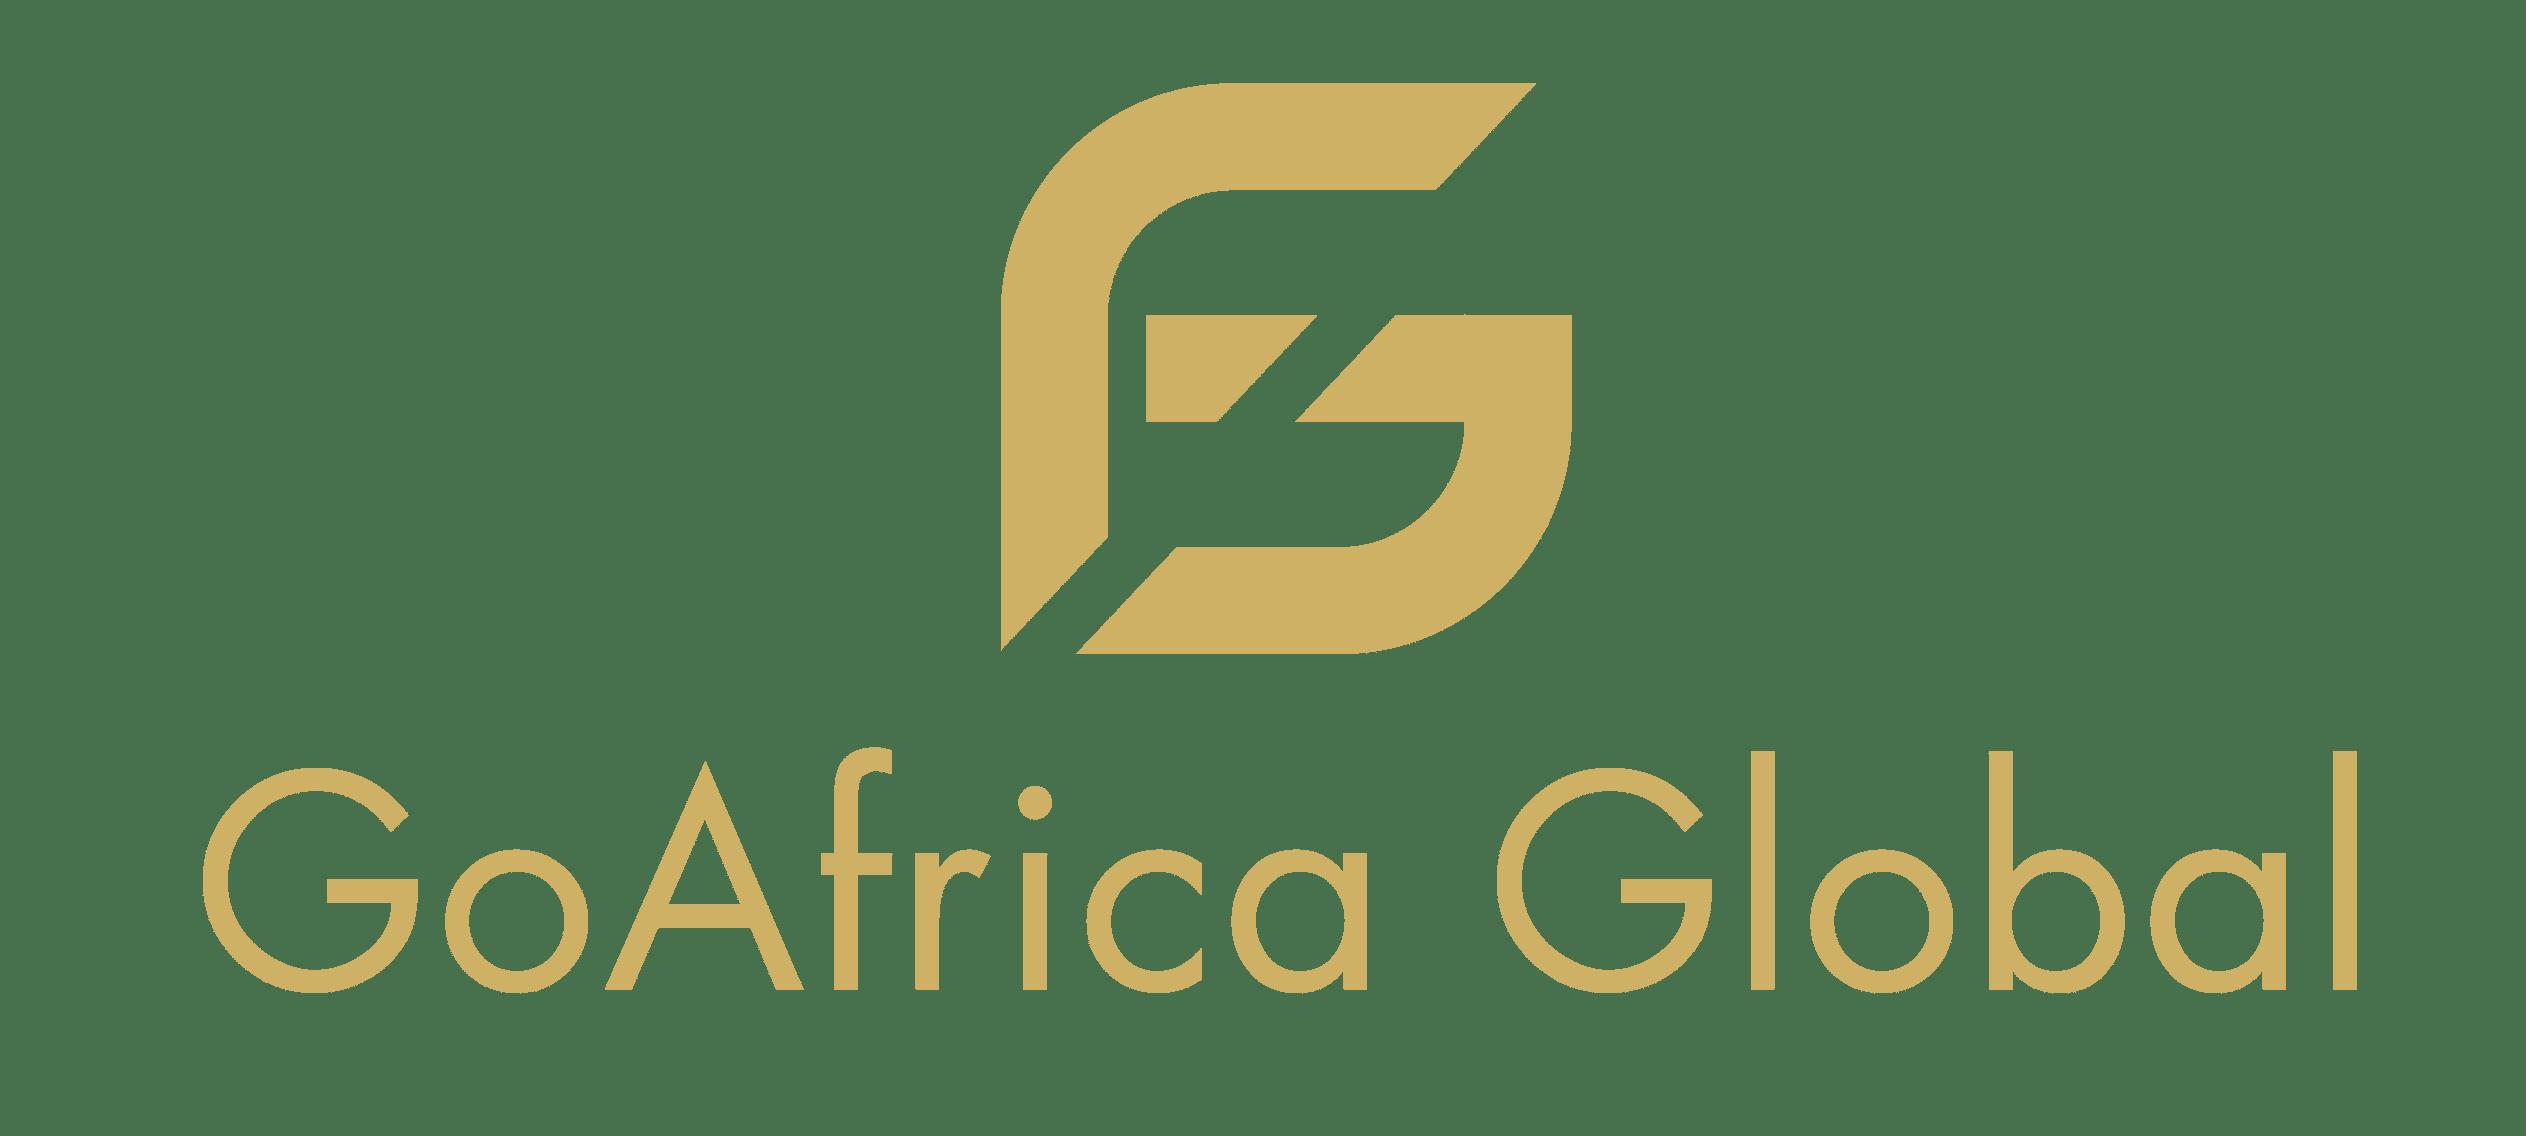 Go Africa Global